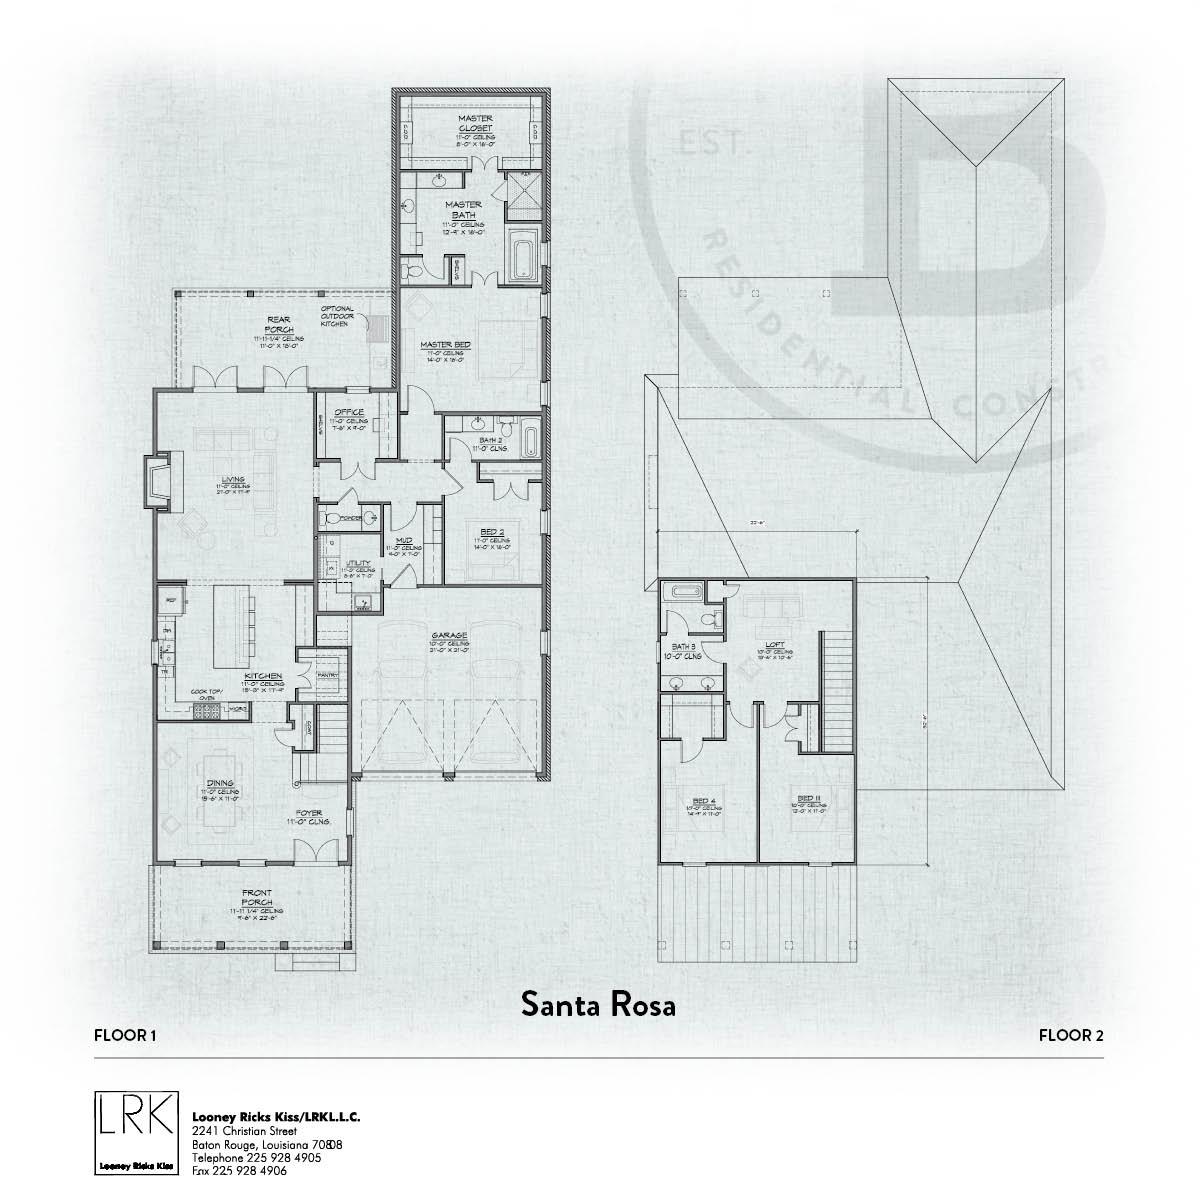 Santa Rosa Floorplan